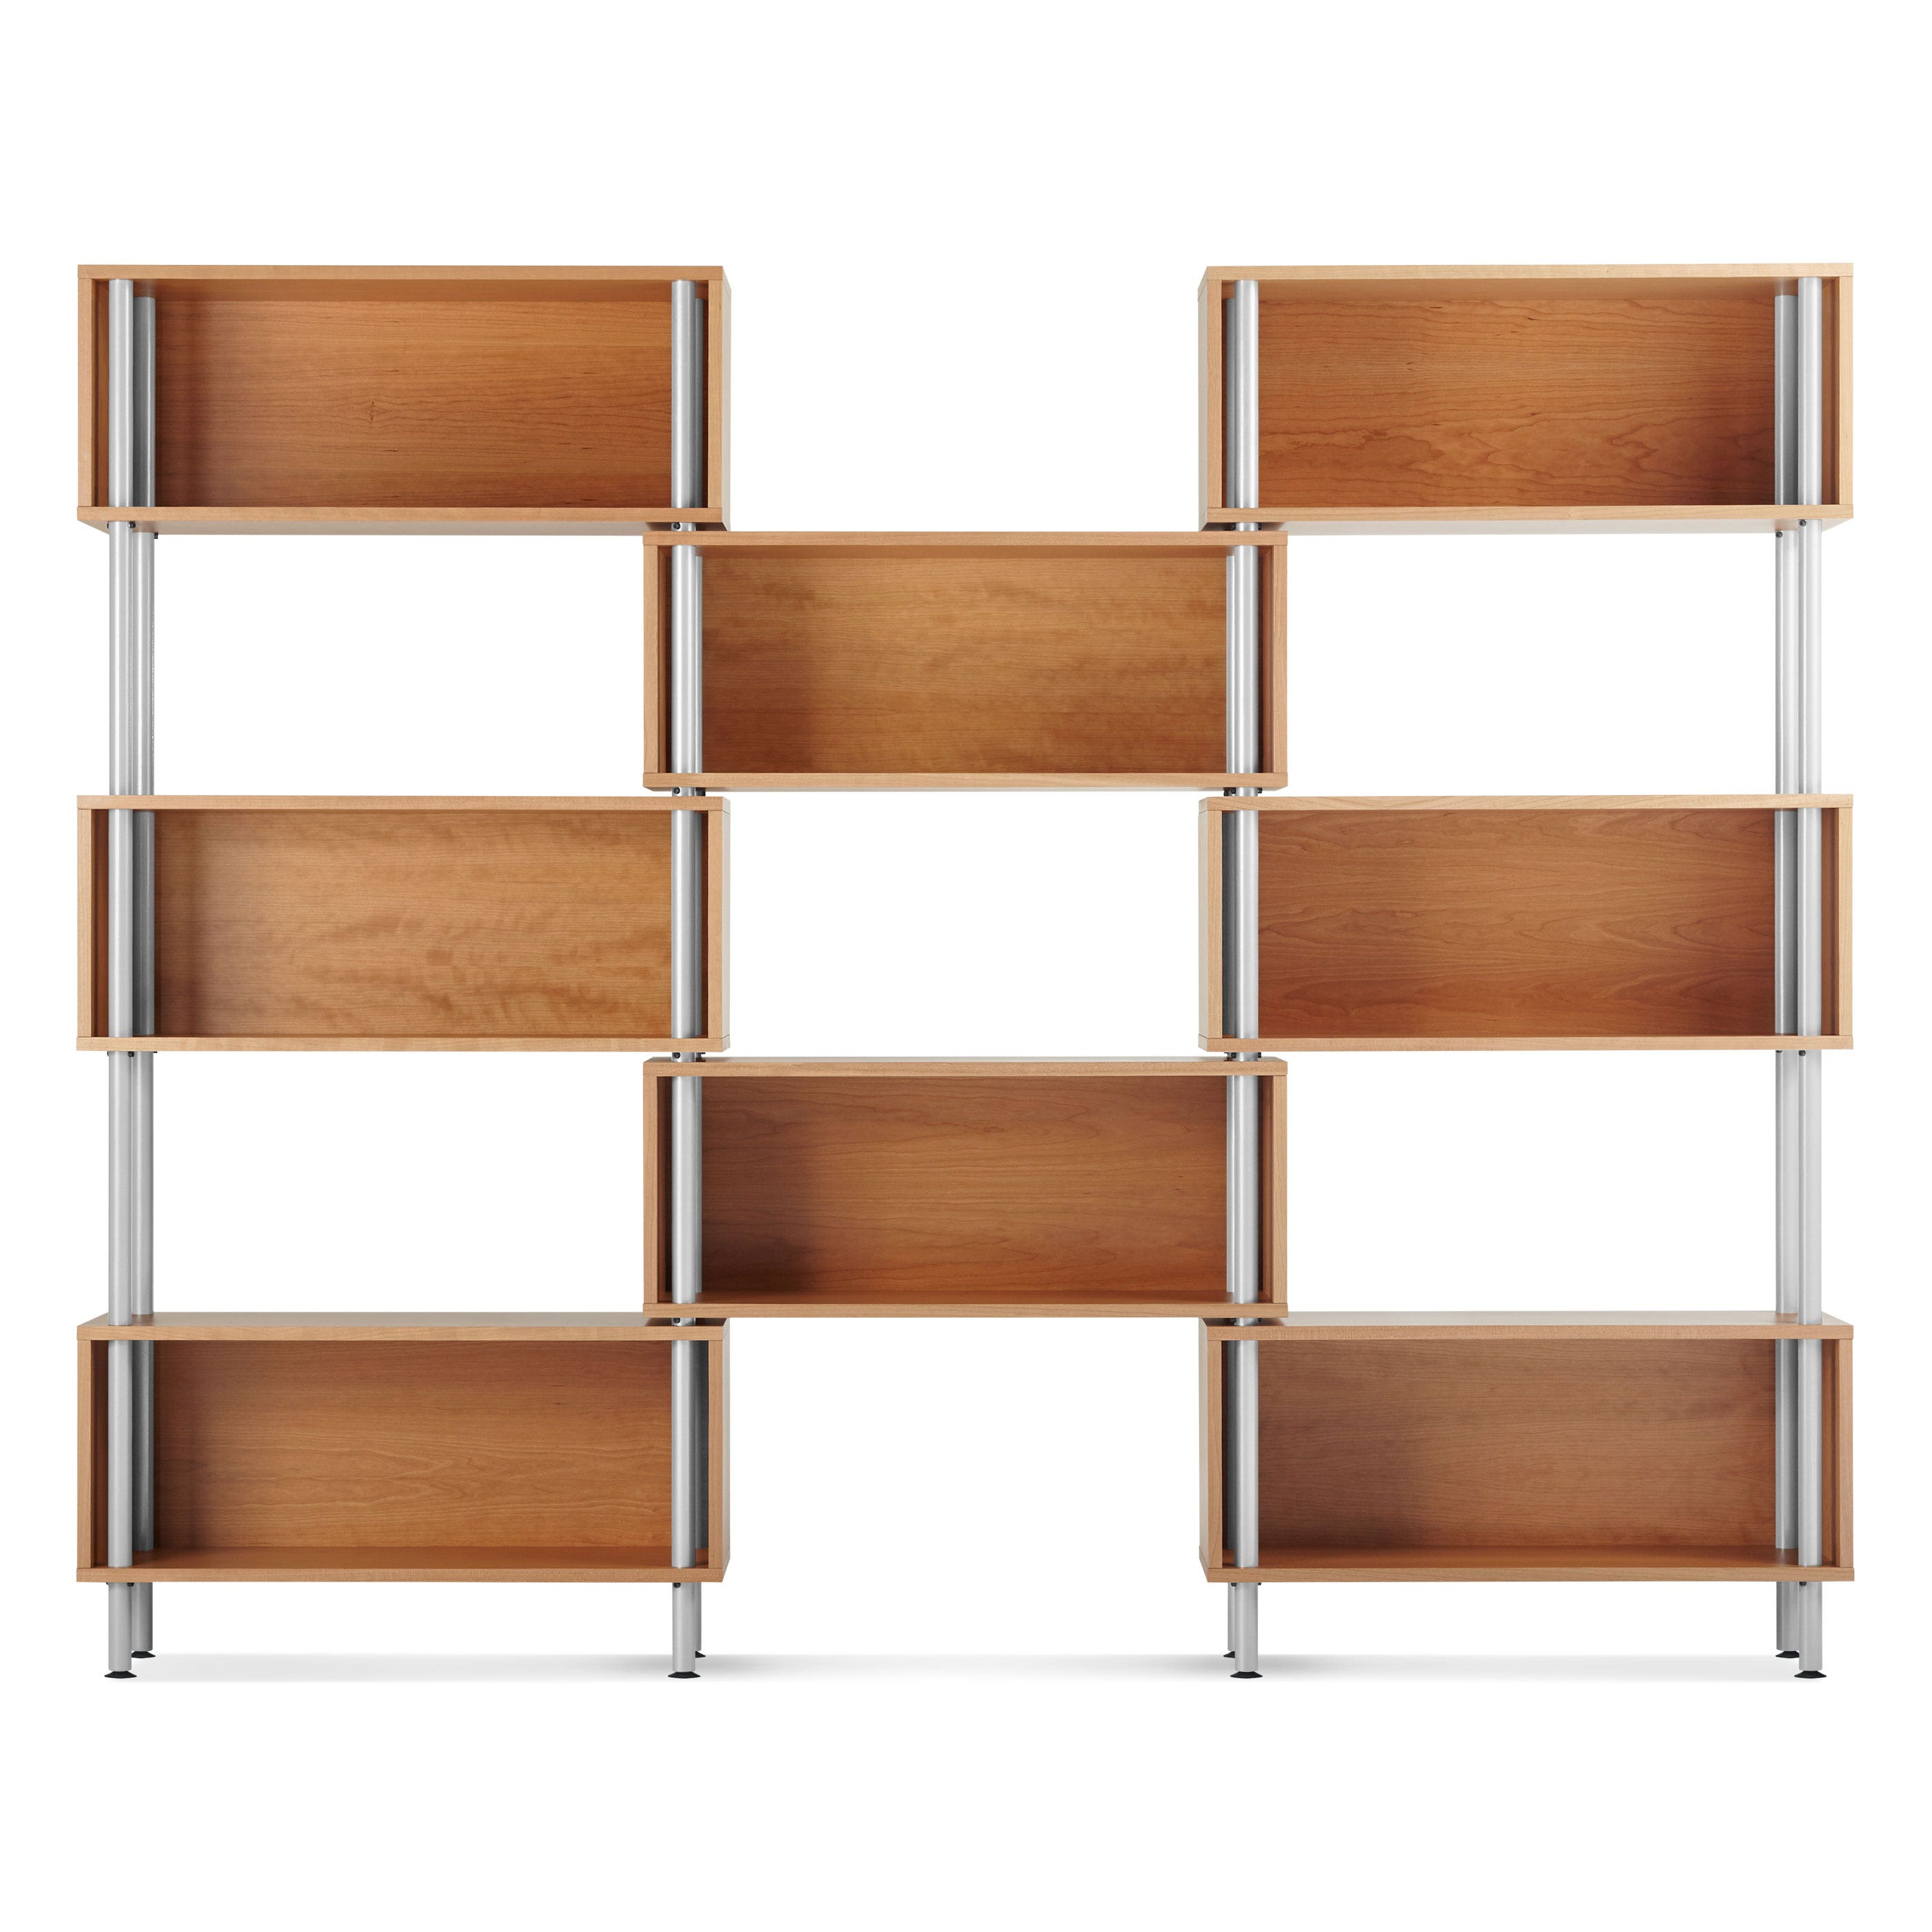 box unit shelf original by com pallet notonthehighstreet product the cambrewood